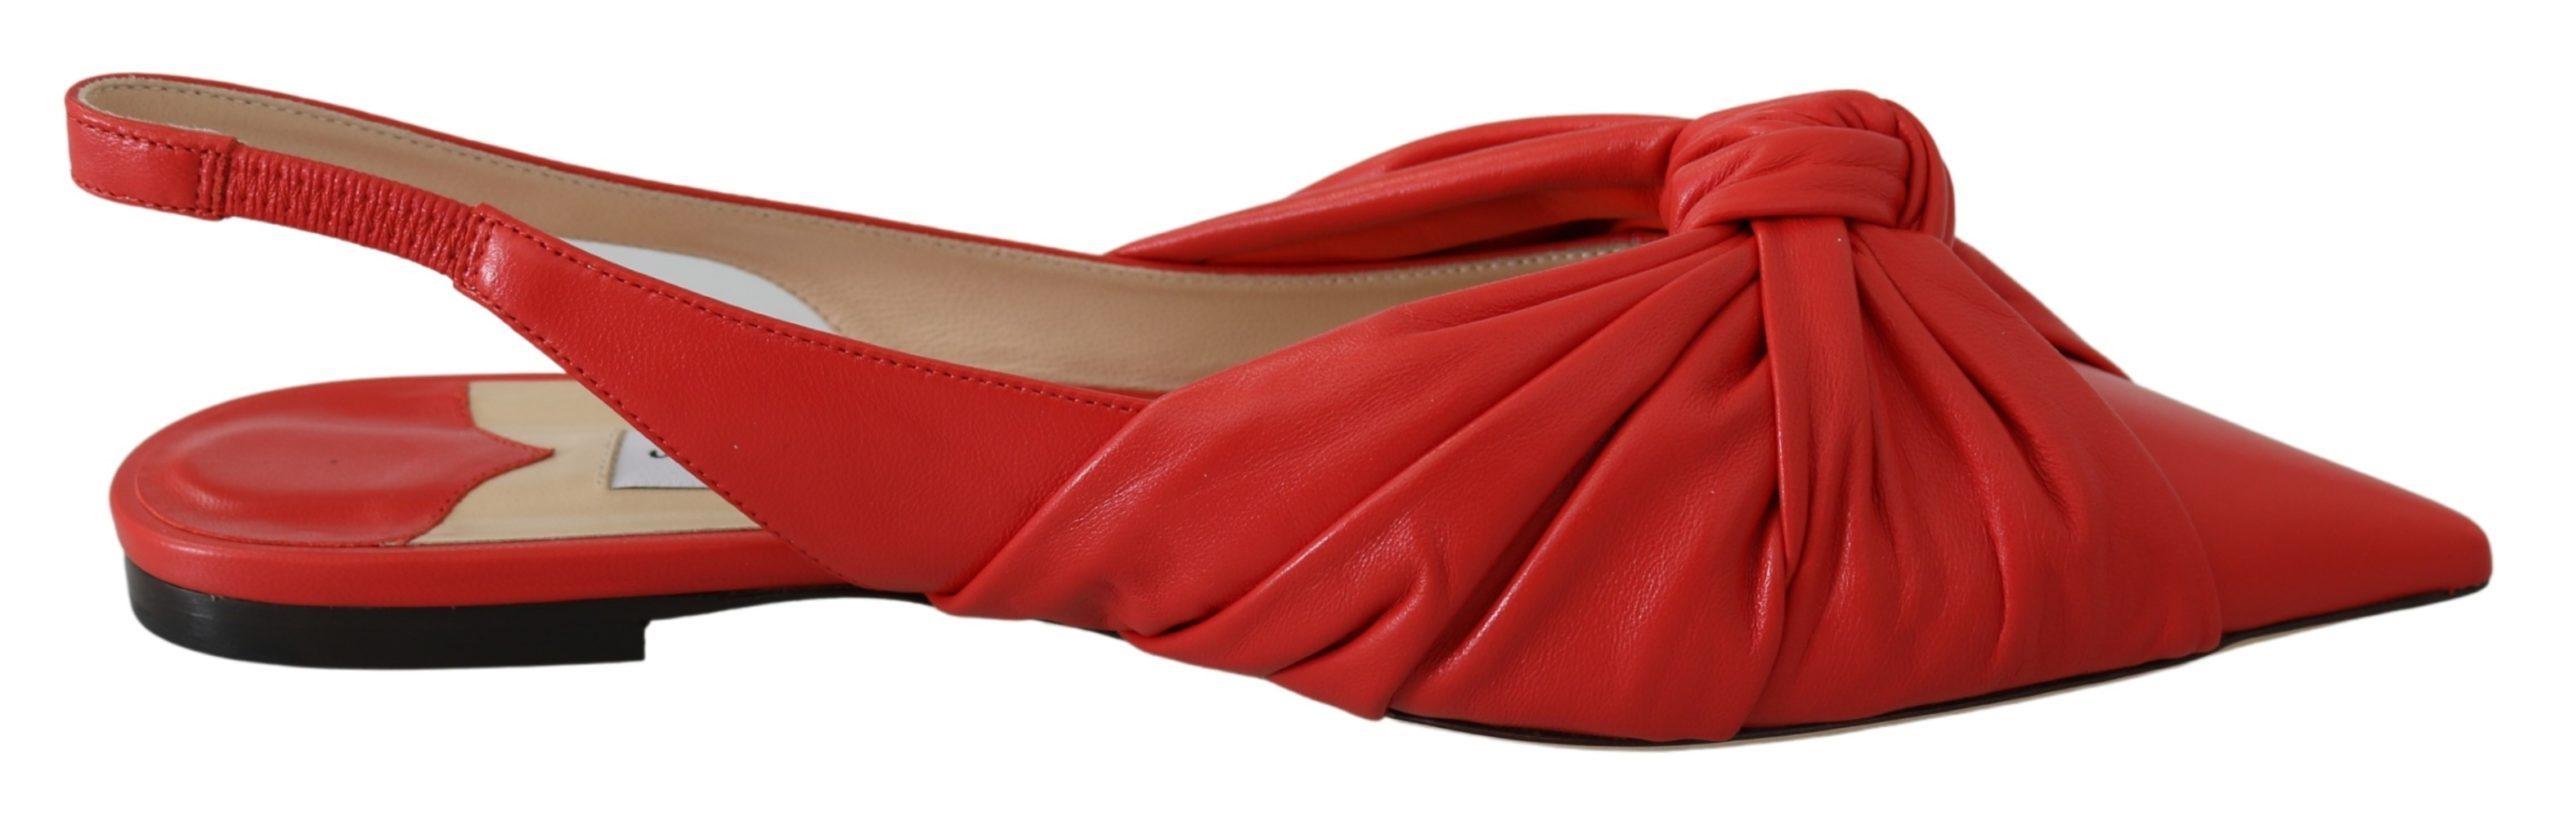 Jimmy Choo Women's Annabell Flat Shoes Red 191714981690 - EU36.5/US6.5